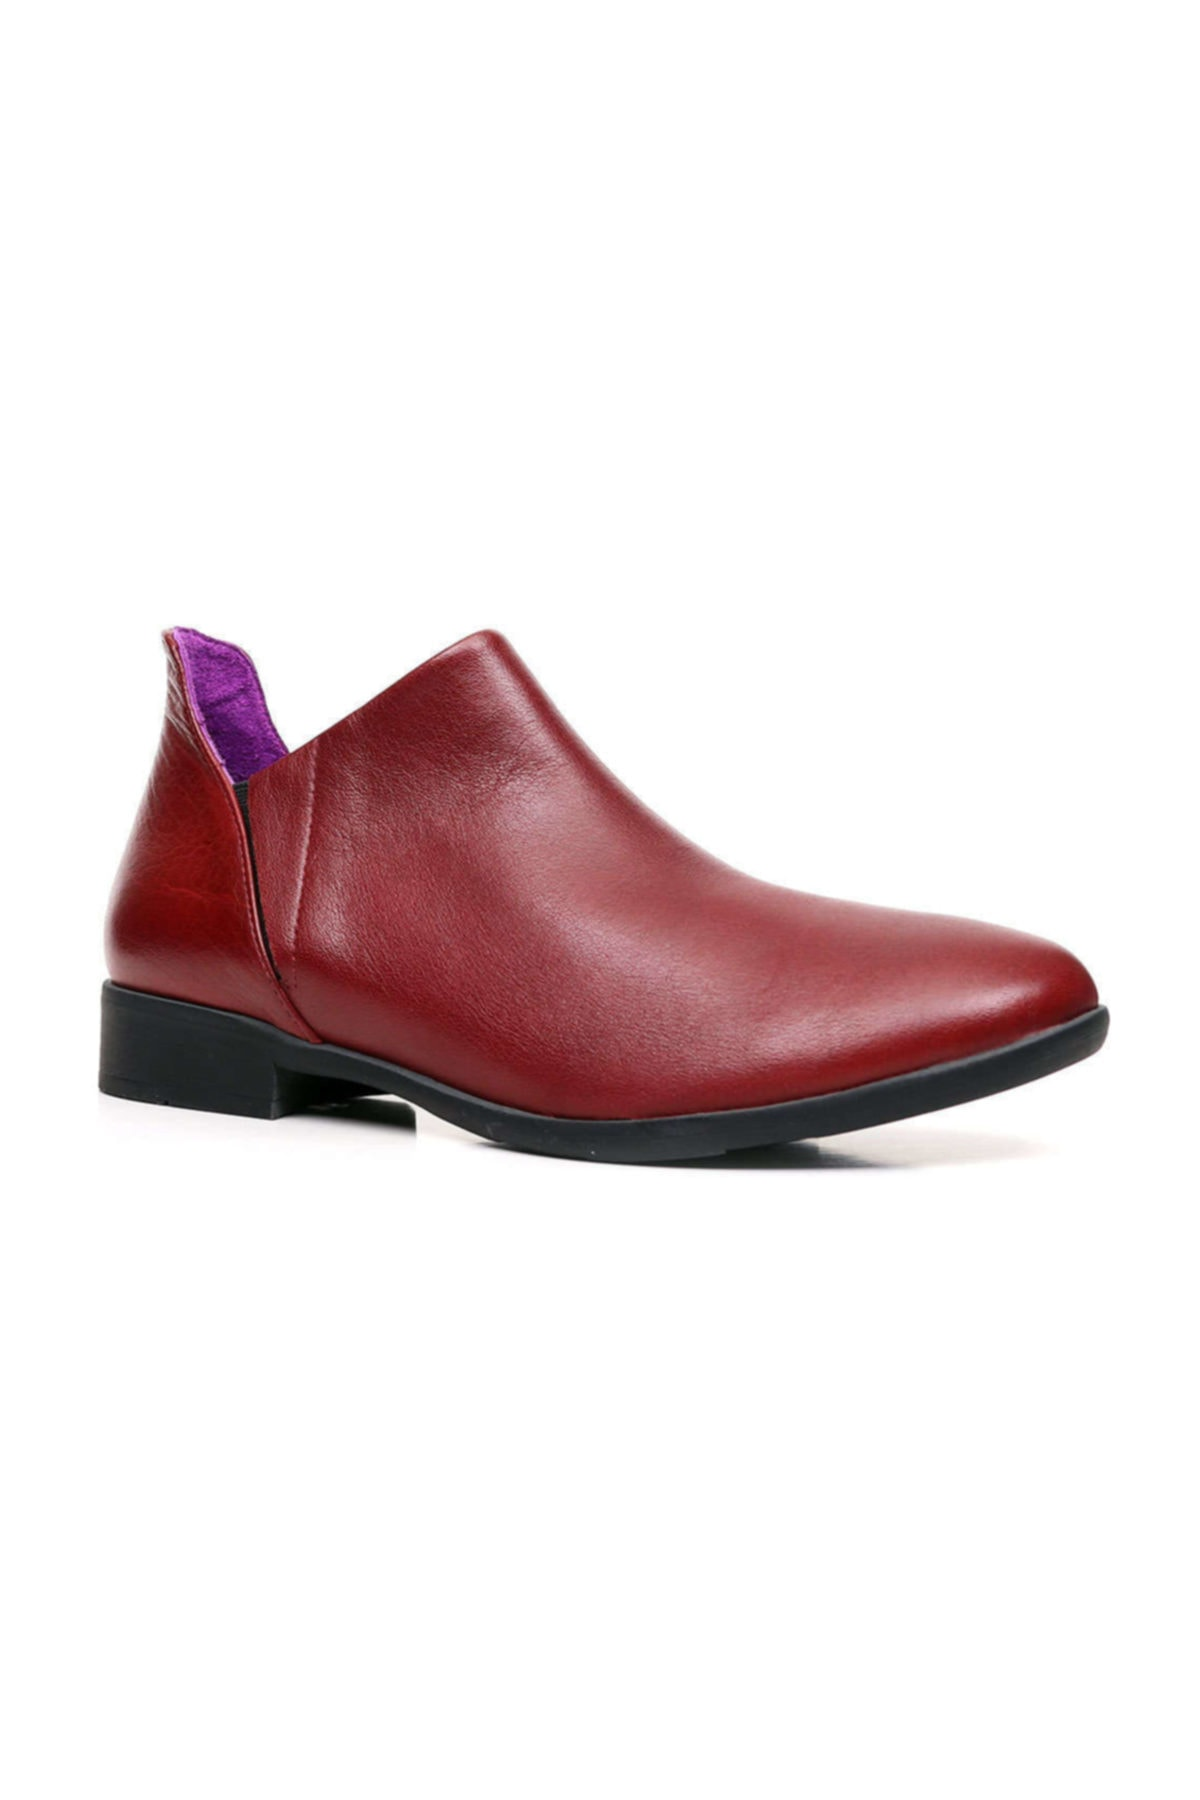 BUENO Shoes  Kadın Ayakkabı 9p2300 1